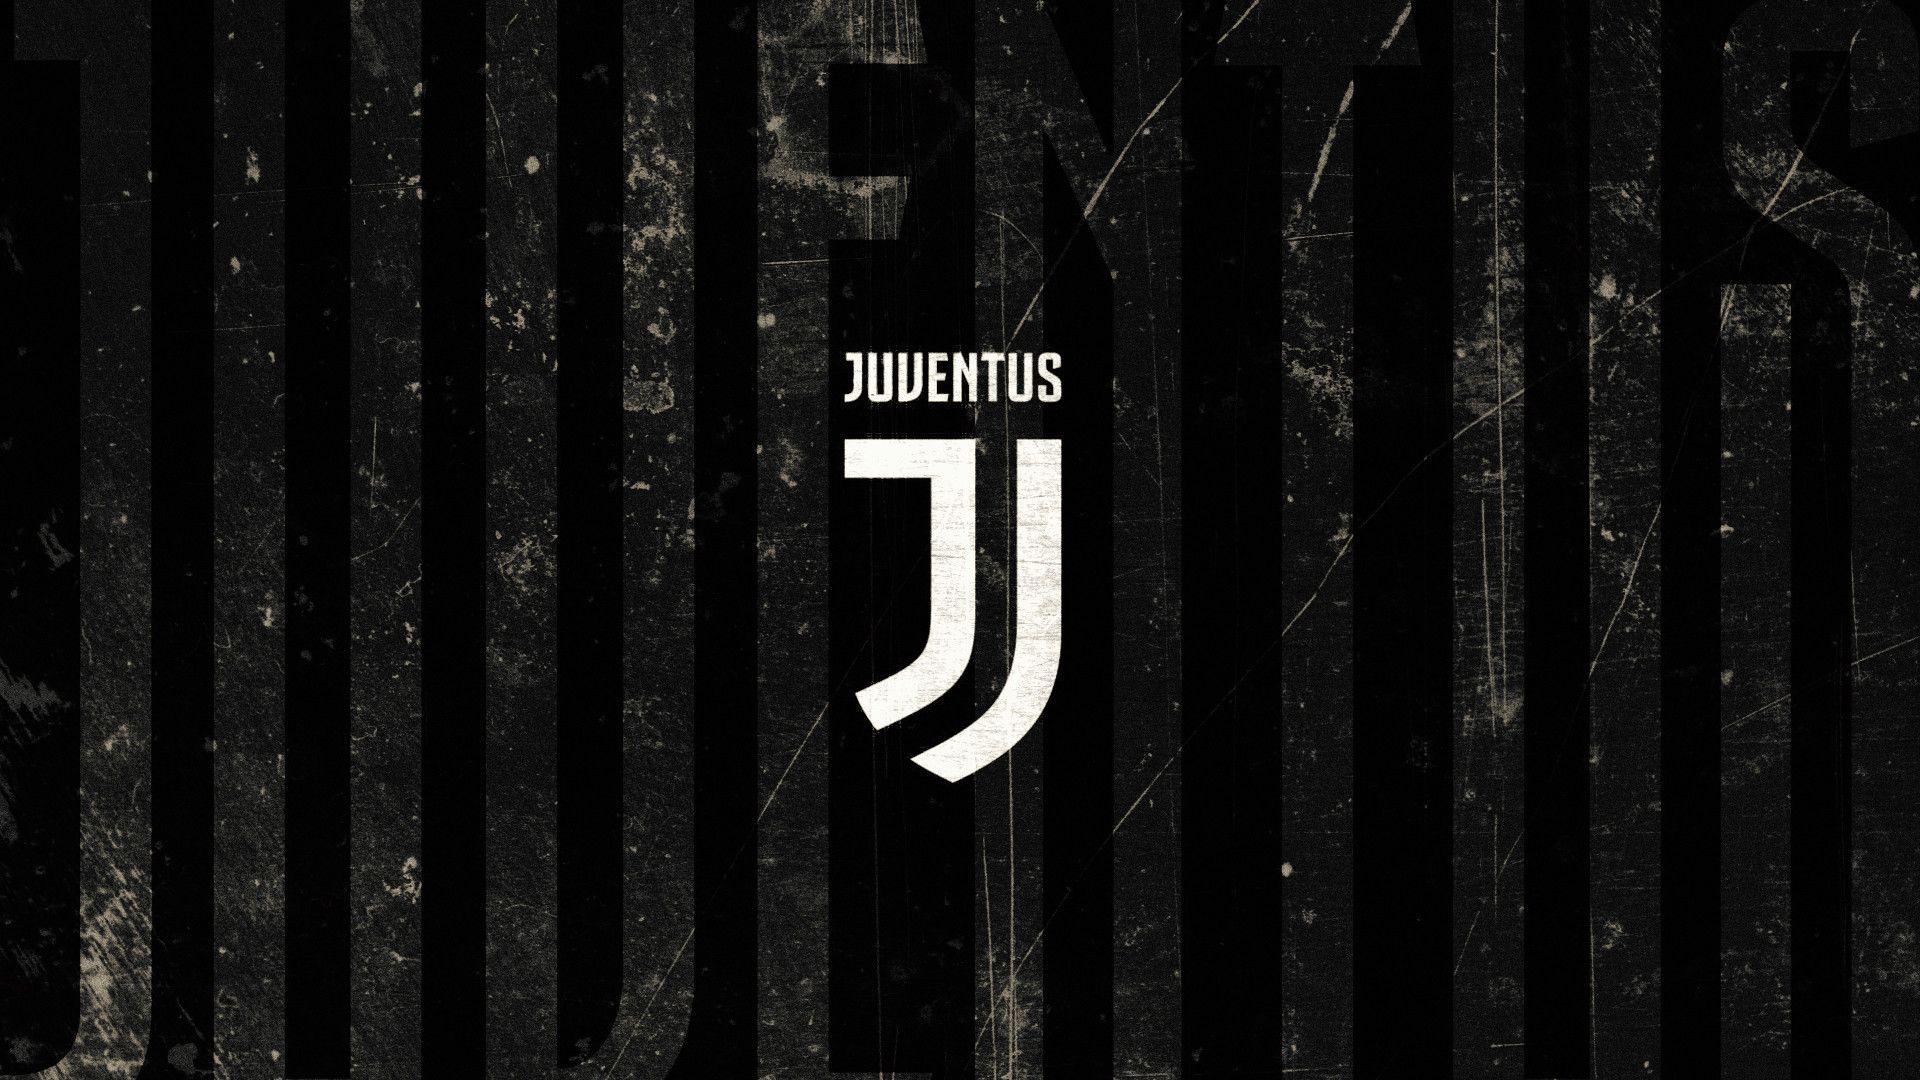 New Logo Juventus Wallpaper 19201080 Hd Wallpaper Wallpaper